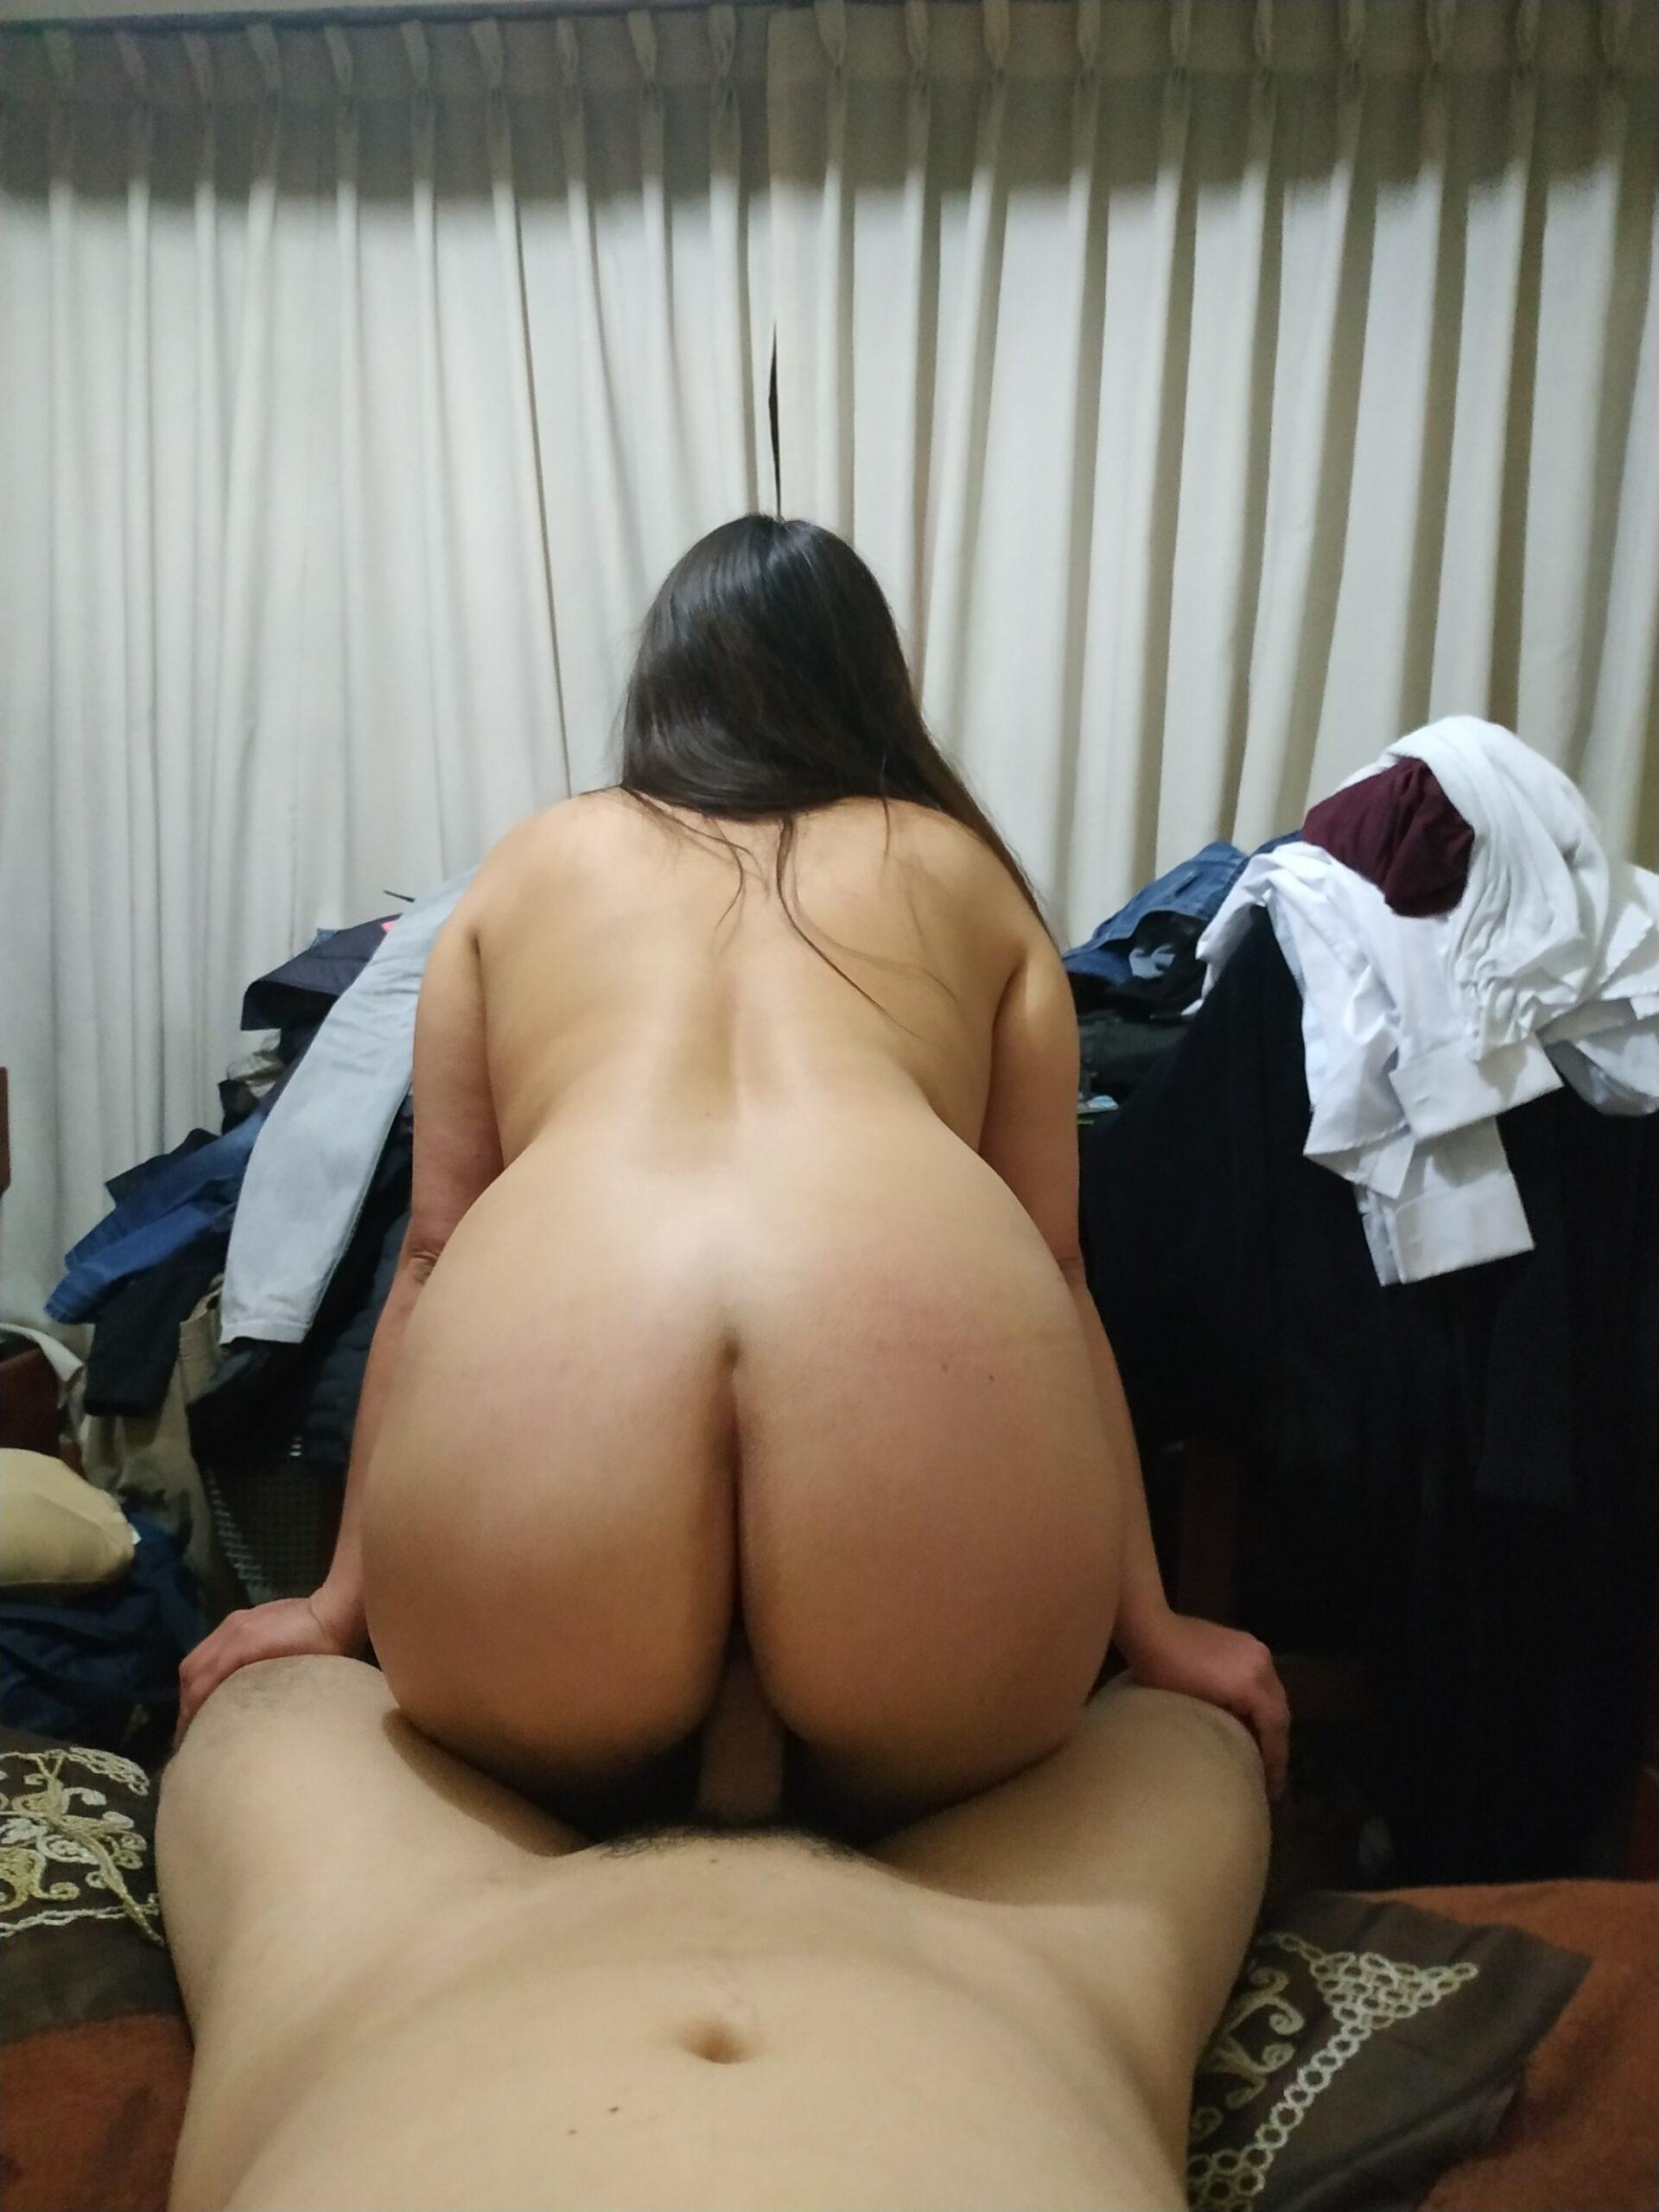 Mujeres Argentinas fotos xxx mujeres para coger maduras jovencitas latinas 4